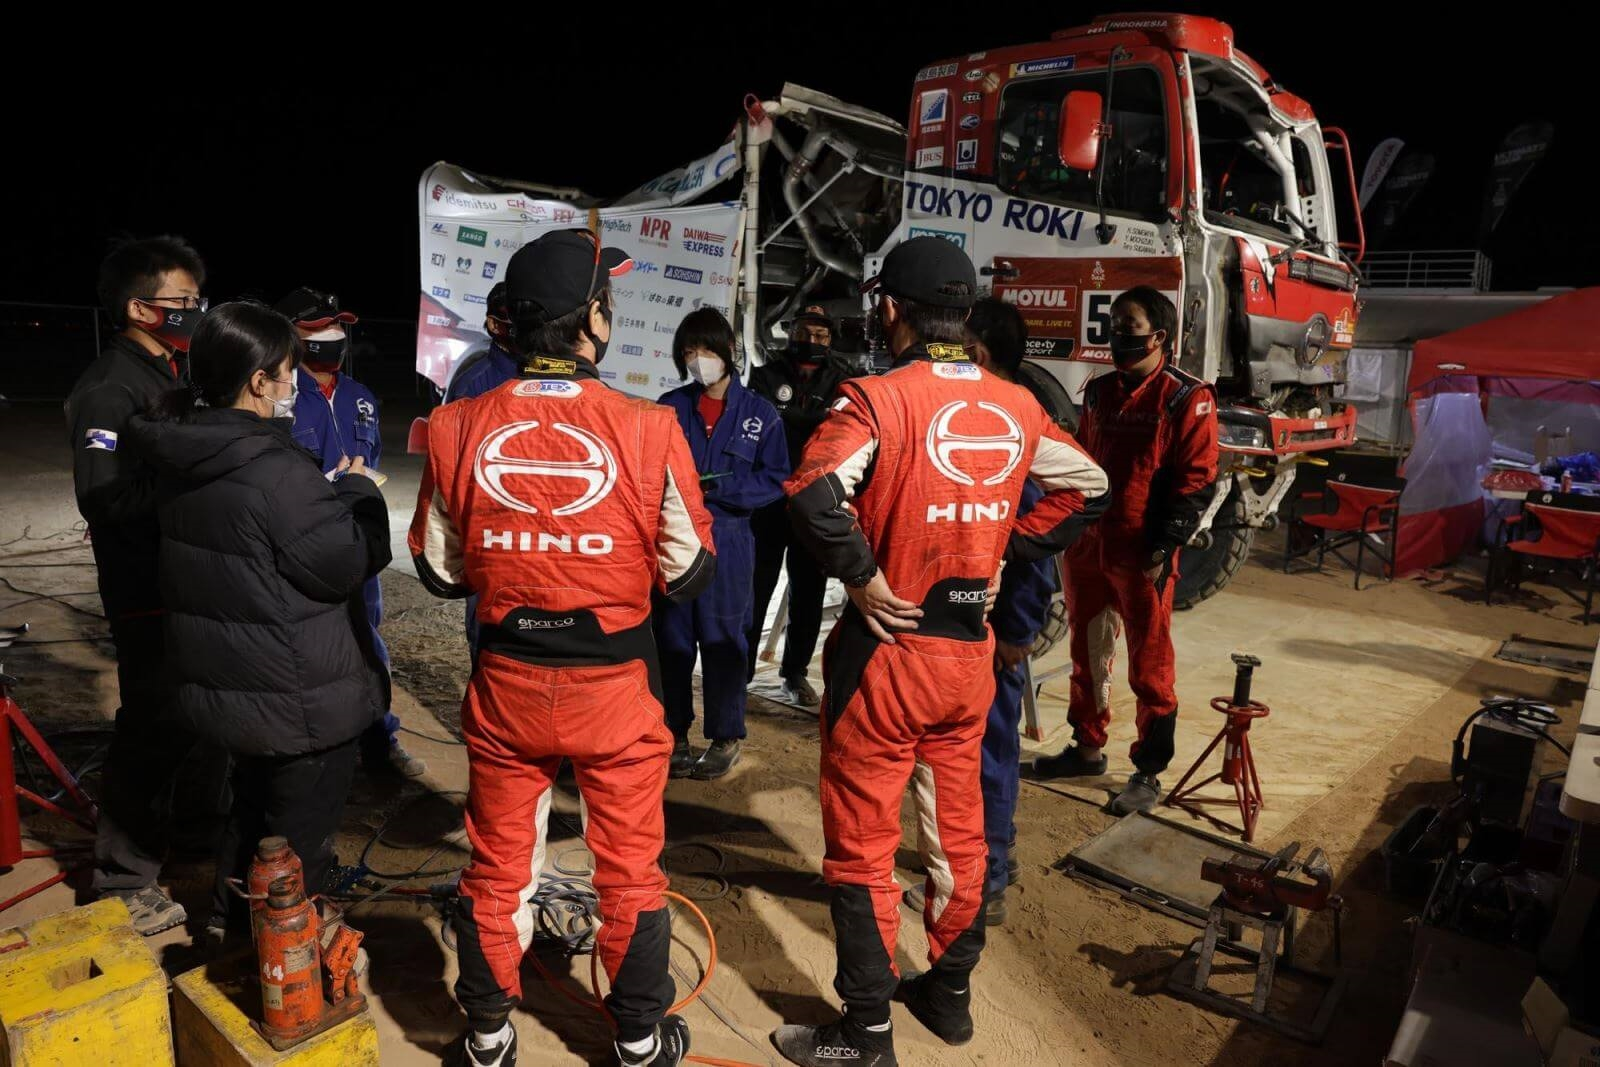 Hino Team Dakar Rally